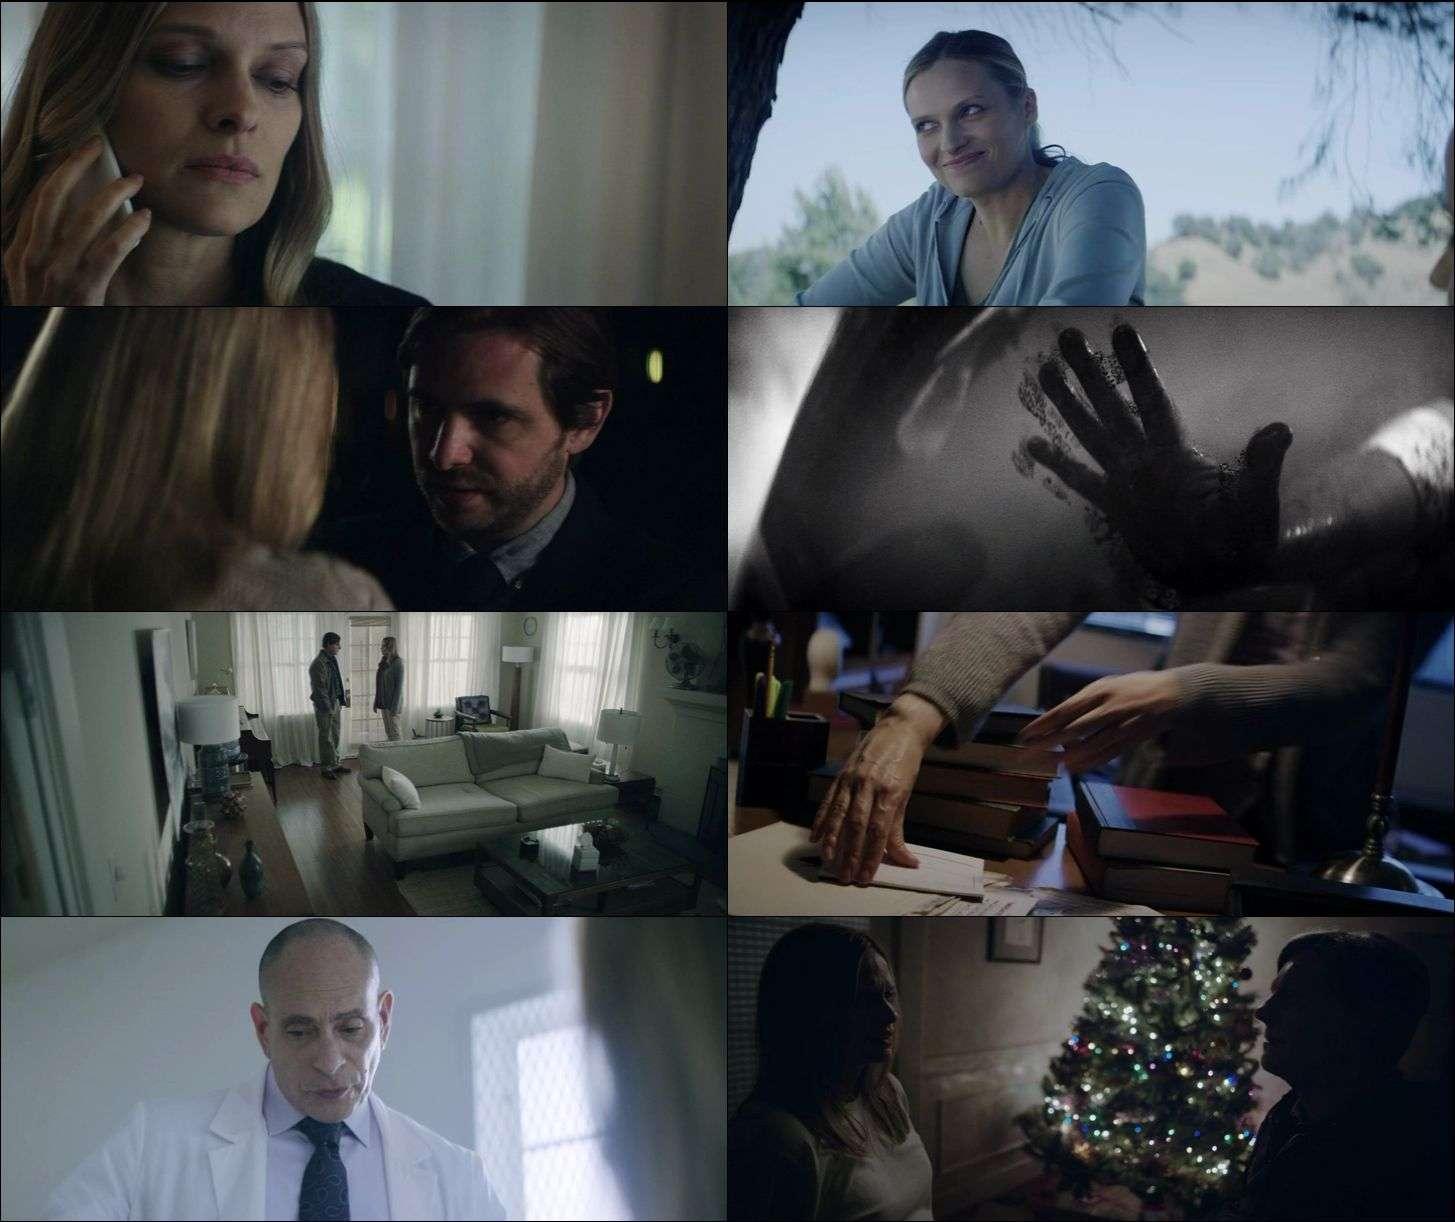 Klinik - Clinical (2017) türkçe dublaj hd film indir